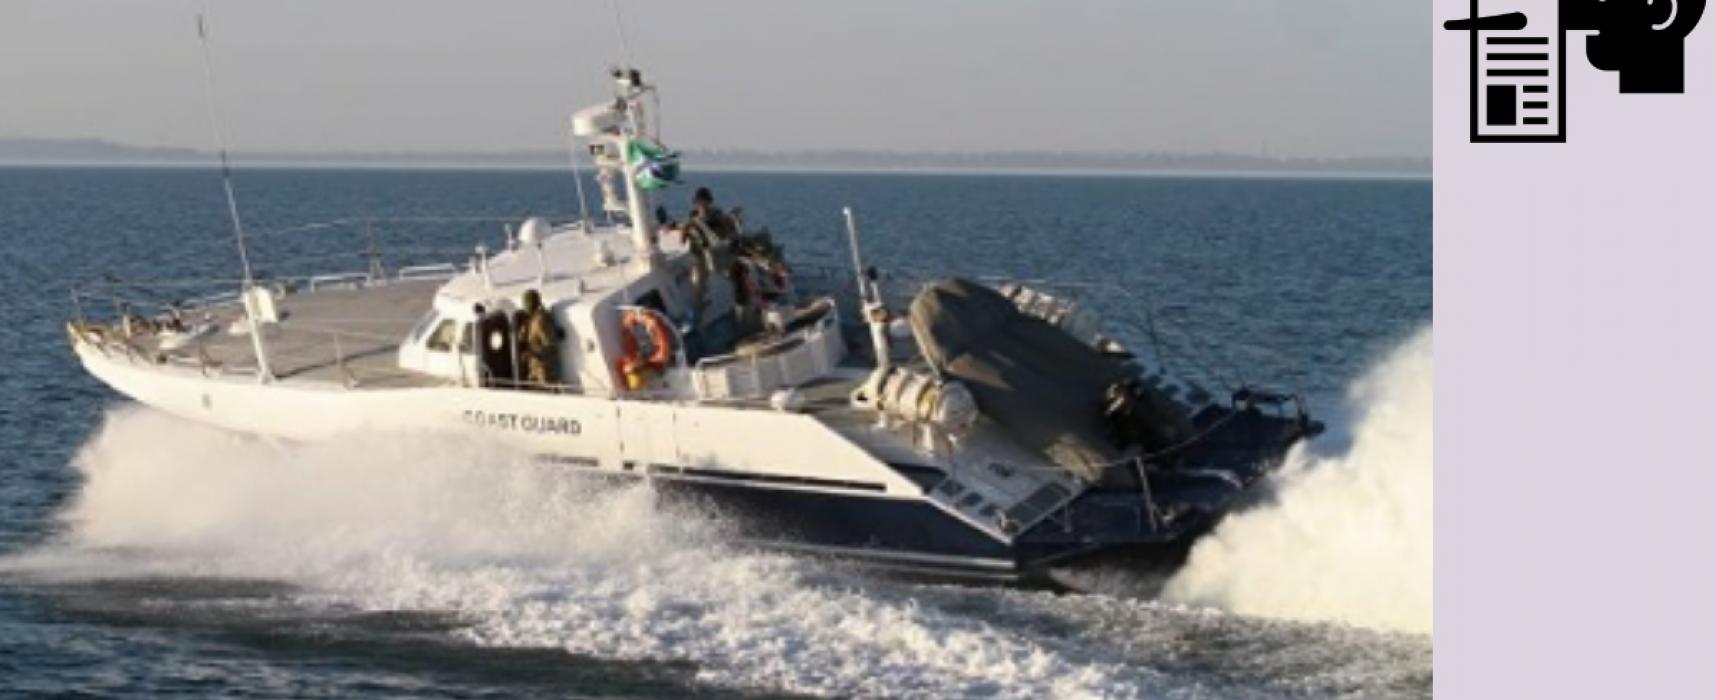 Fake: EU Warns Ukraine against Militarization of Azov Sea